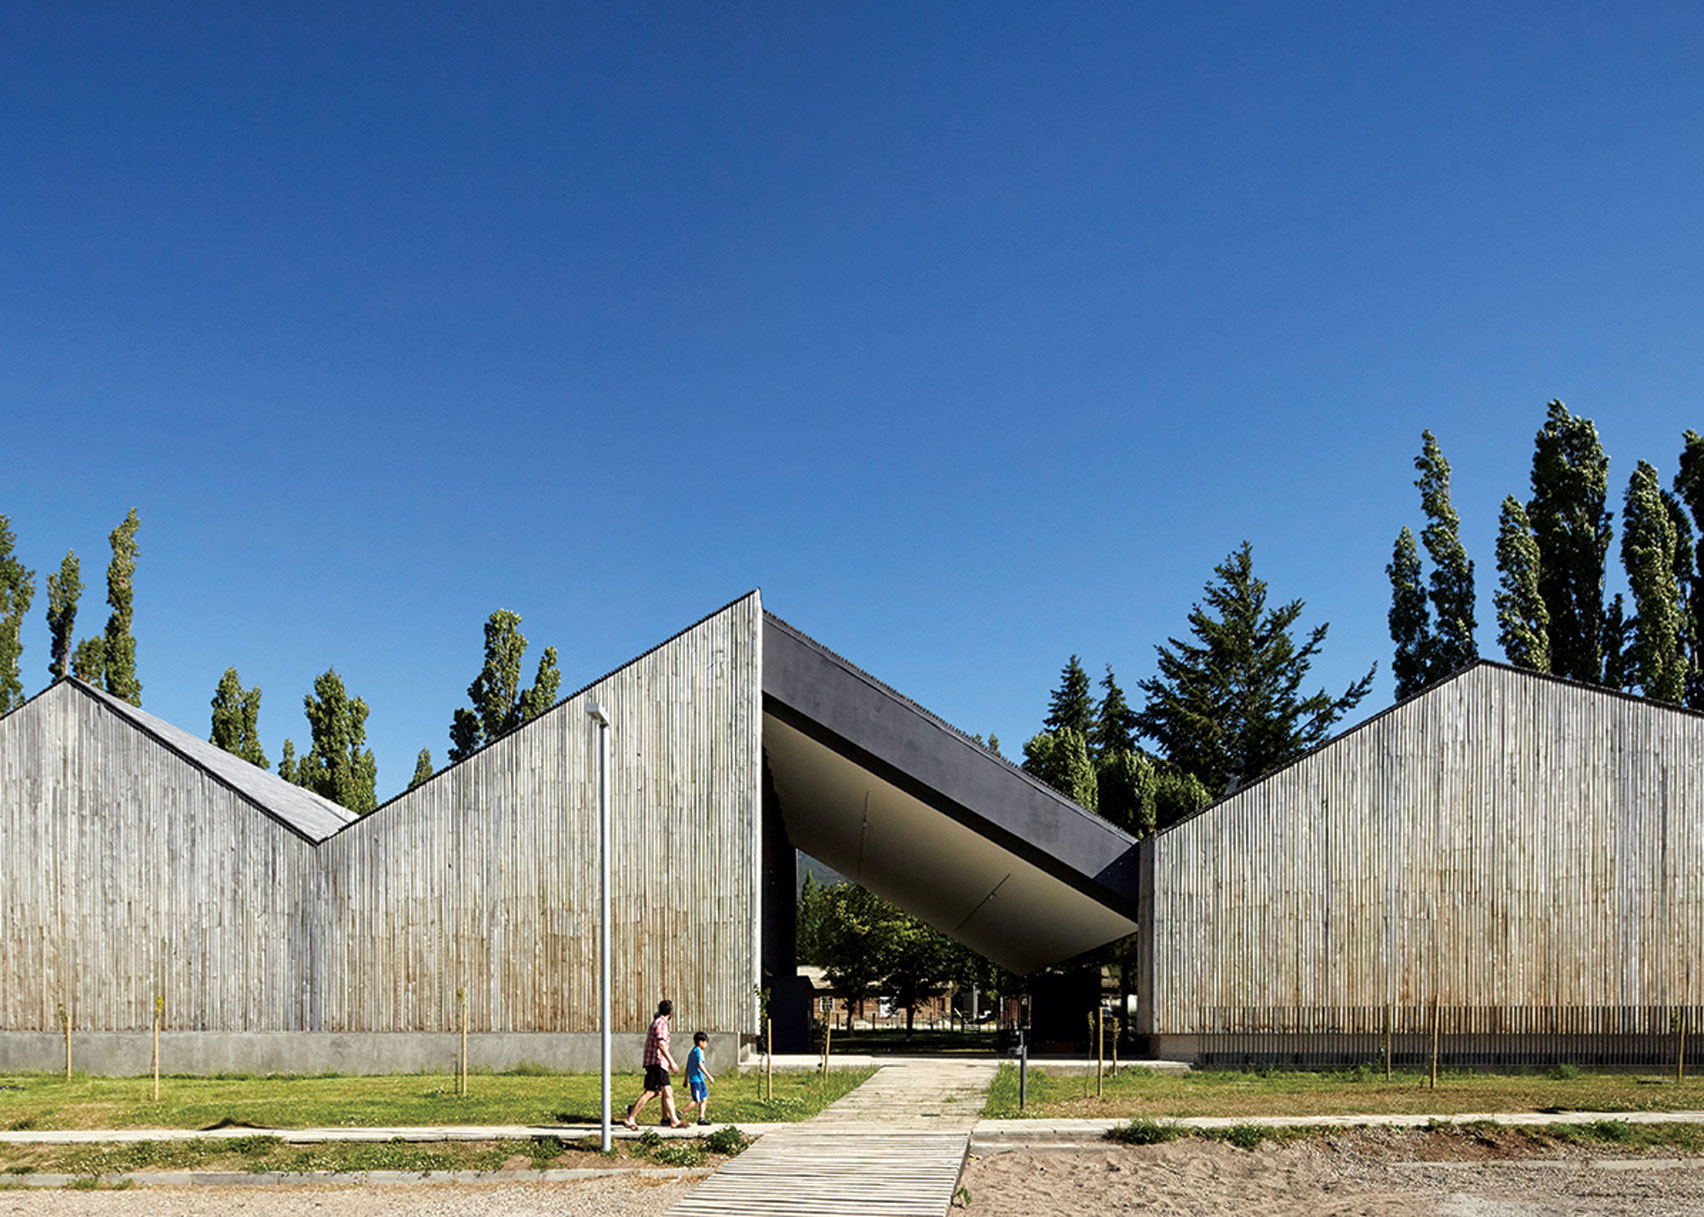 Museo Regional de Aysen by Tirado Arquitectos and Bbats Constulting Projects